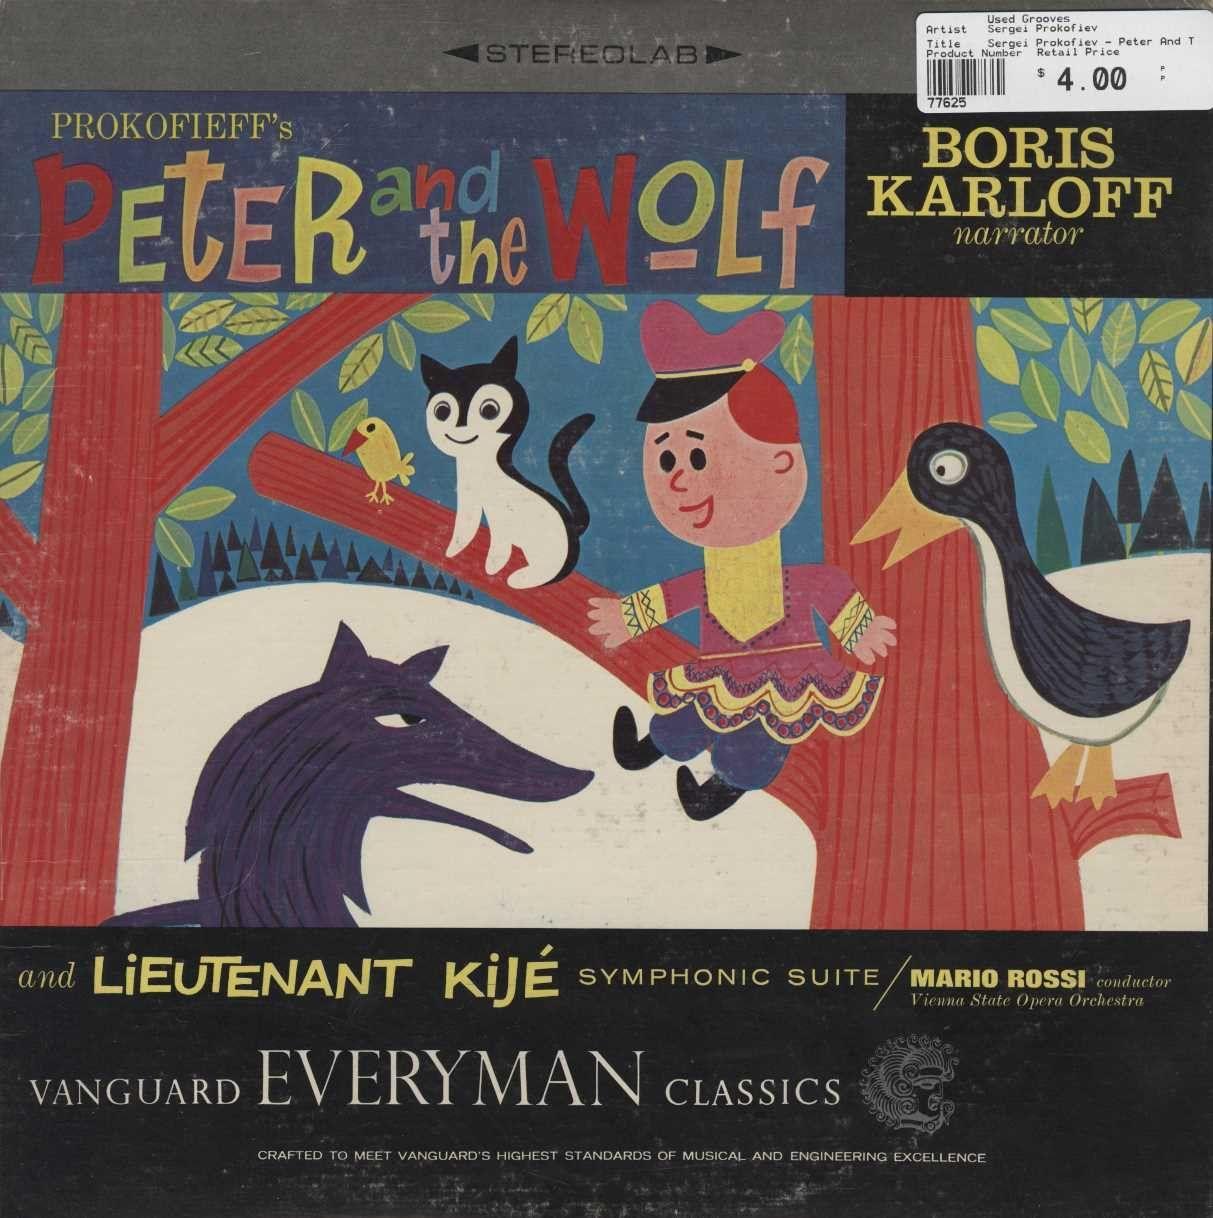 Sergei Prokofiev - Peter And The Wolf, Op. 67